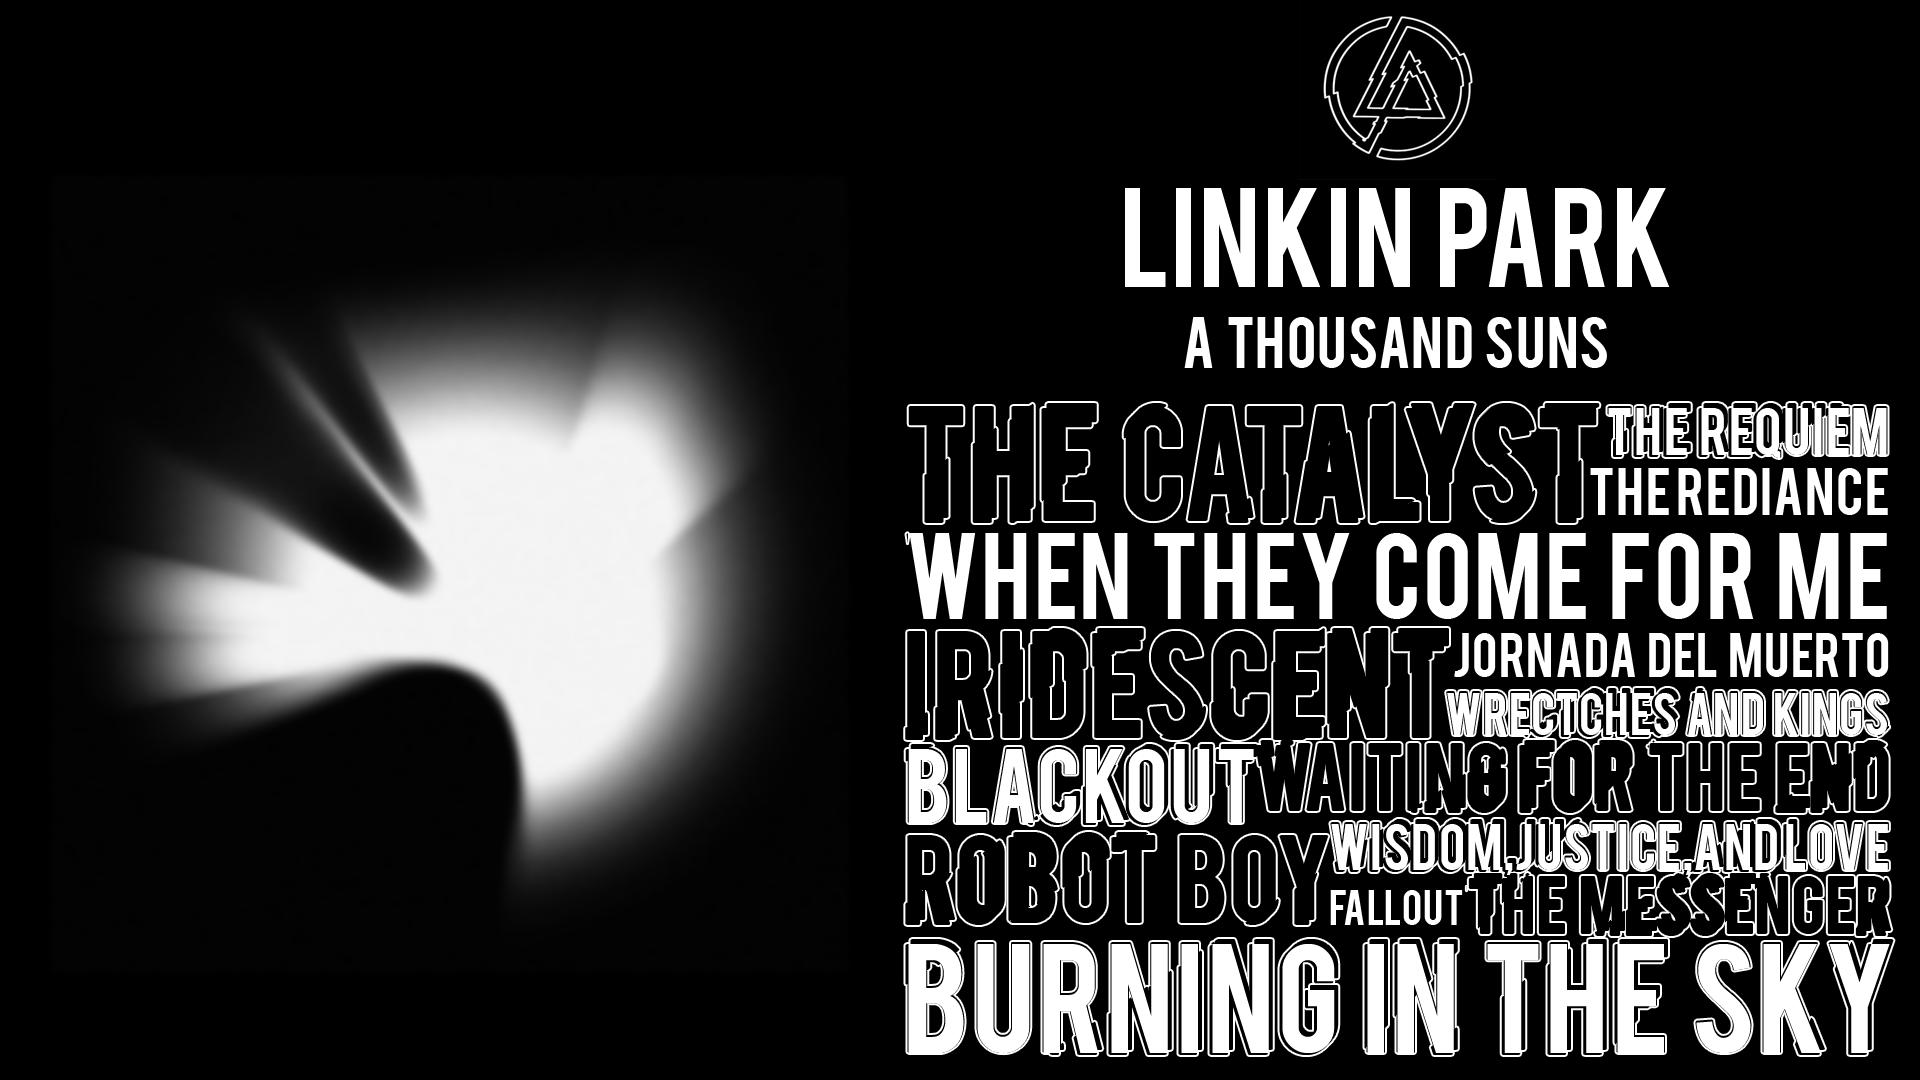 Linkin Park Wallpapers HD 2015 1920x1080